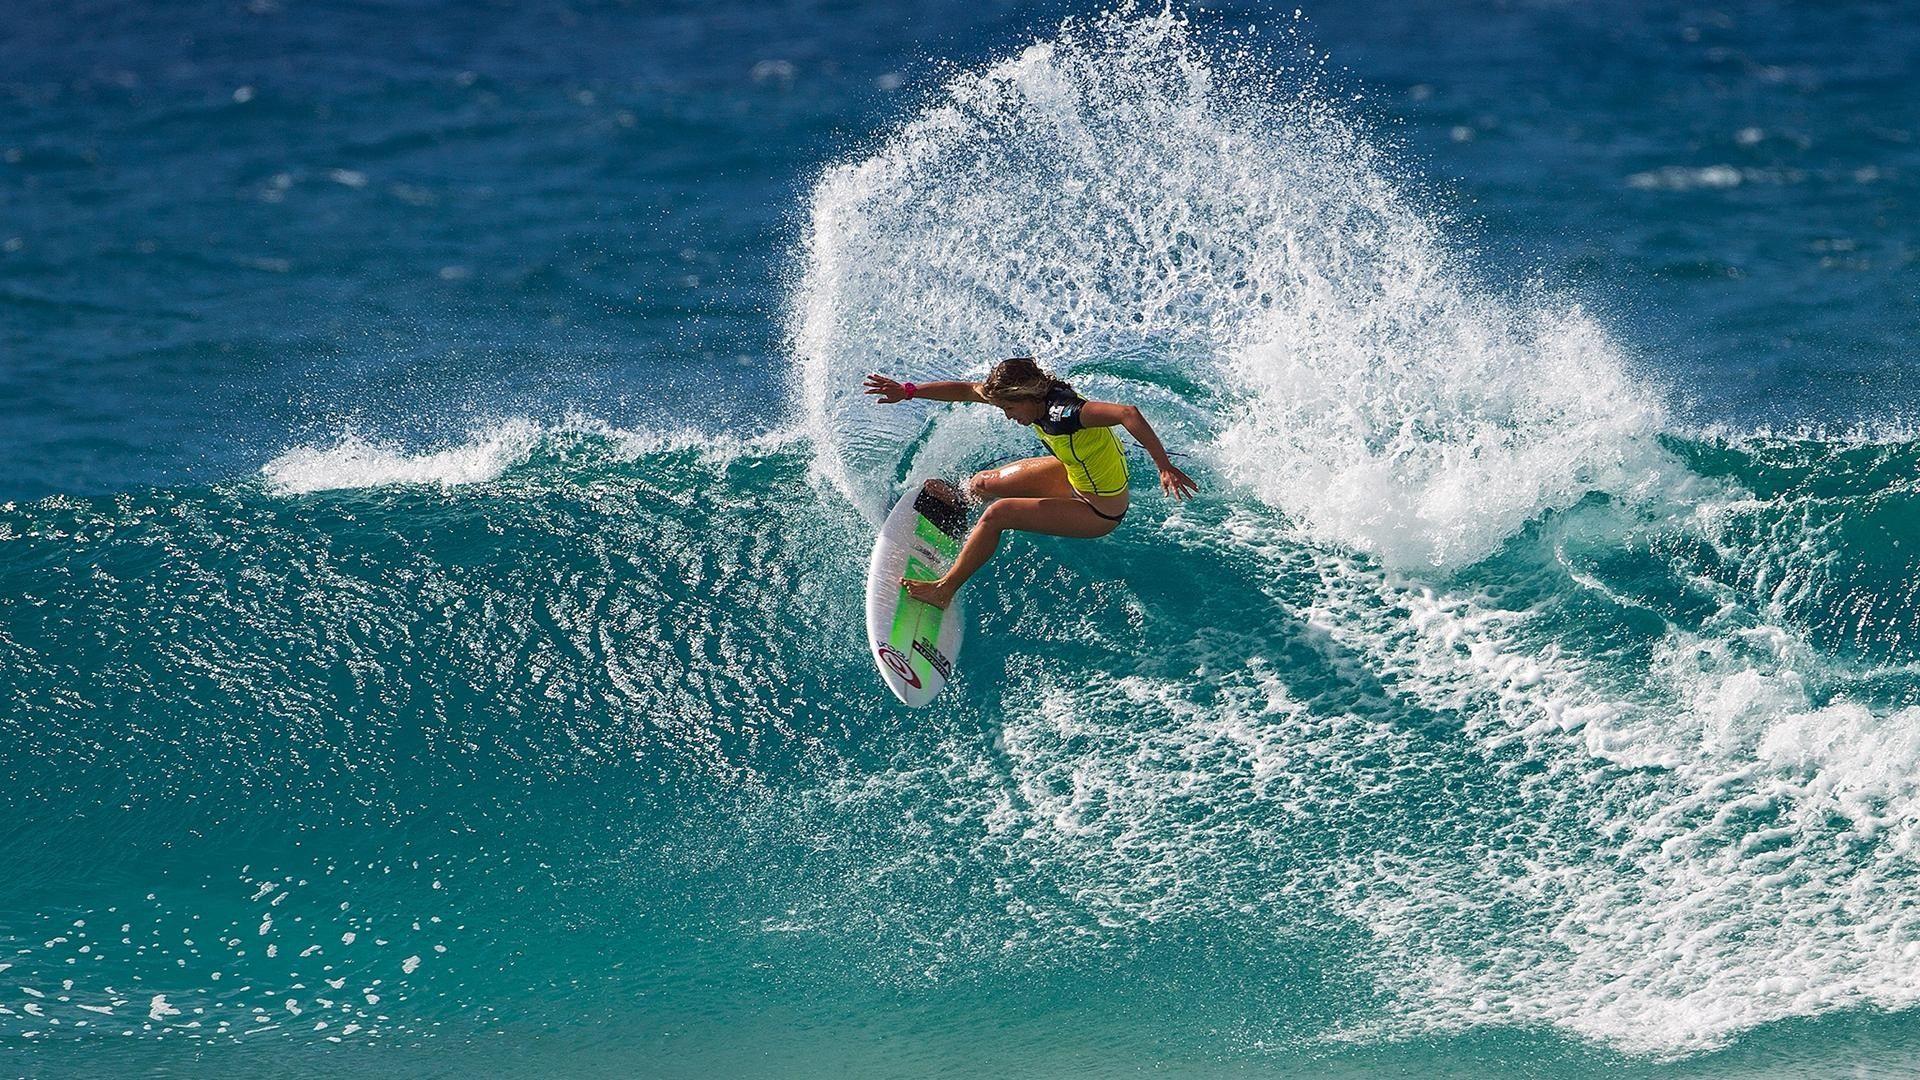 Surfing Wallpaper For Desktop Hd Stan Ross 1920x1080